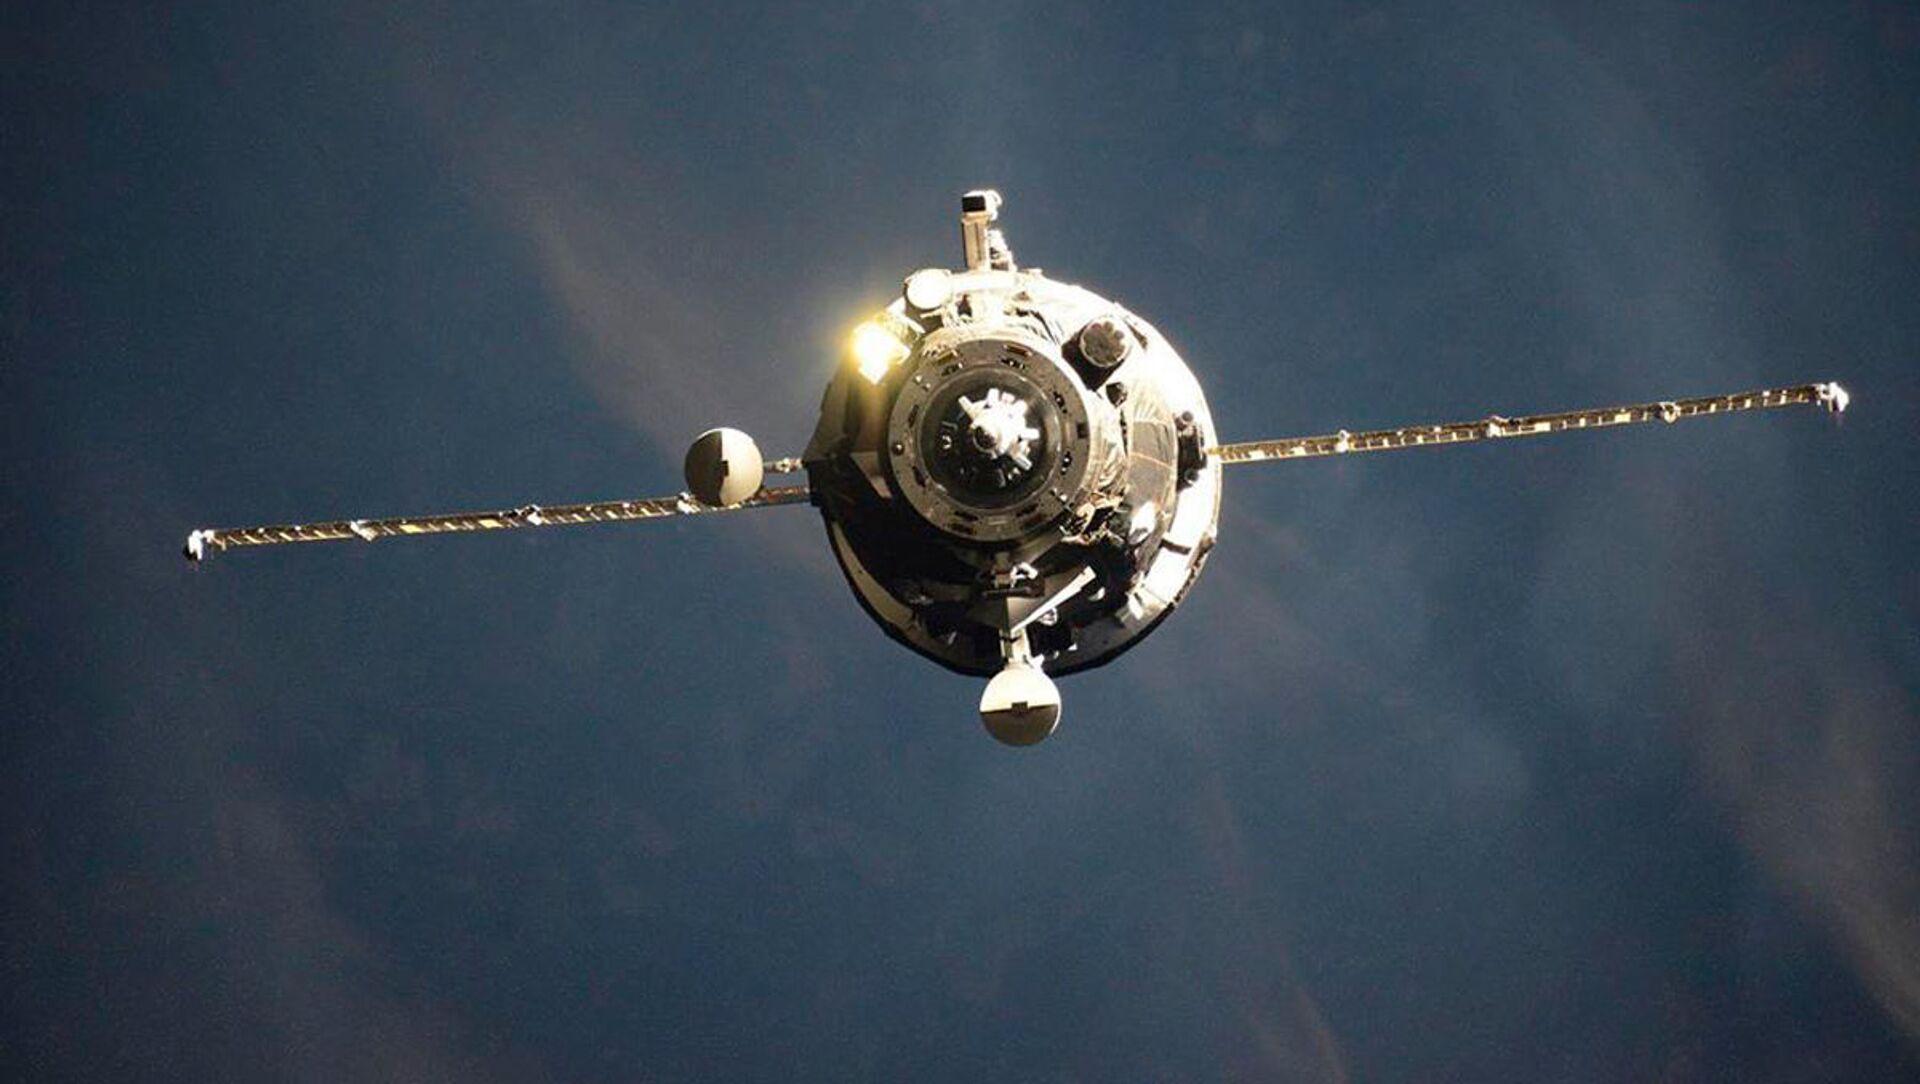 La nave espacial rusa de carga Progress MS-15 - Sputnik Mundo, 1920, 09.02.2021